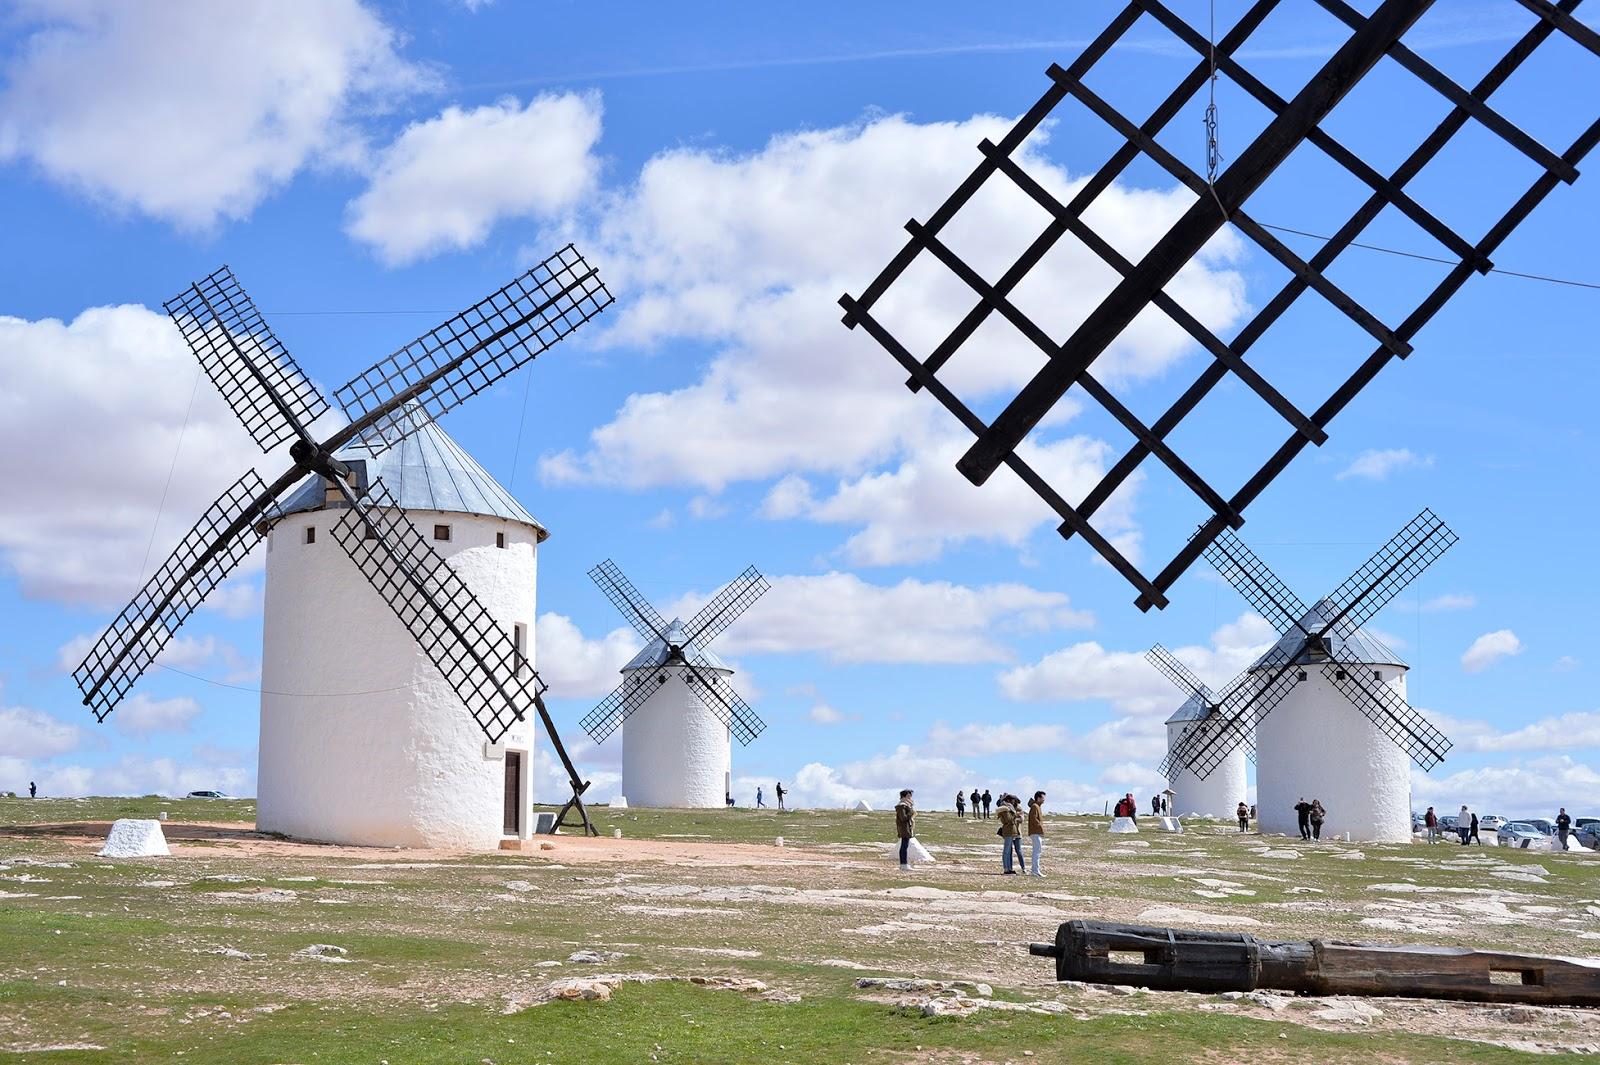 campo criptana molinos windmills